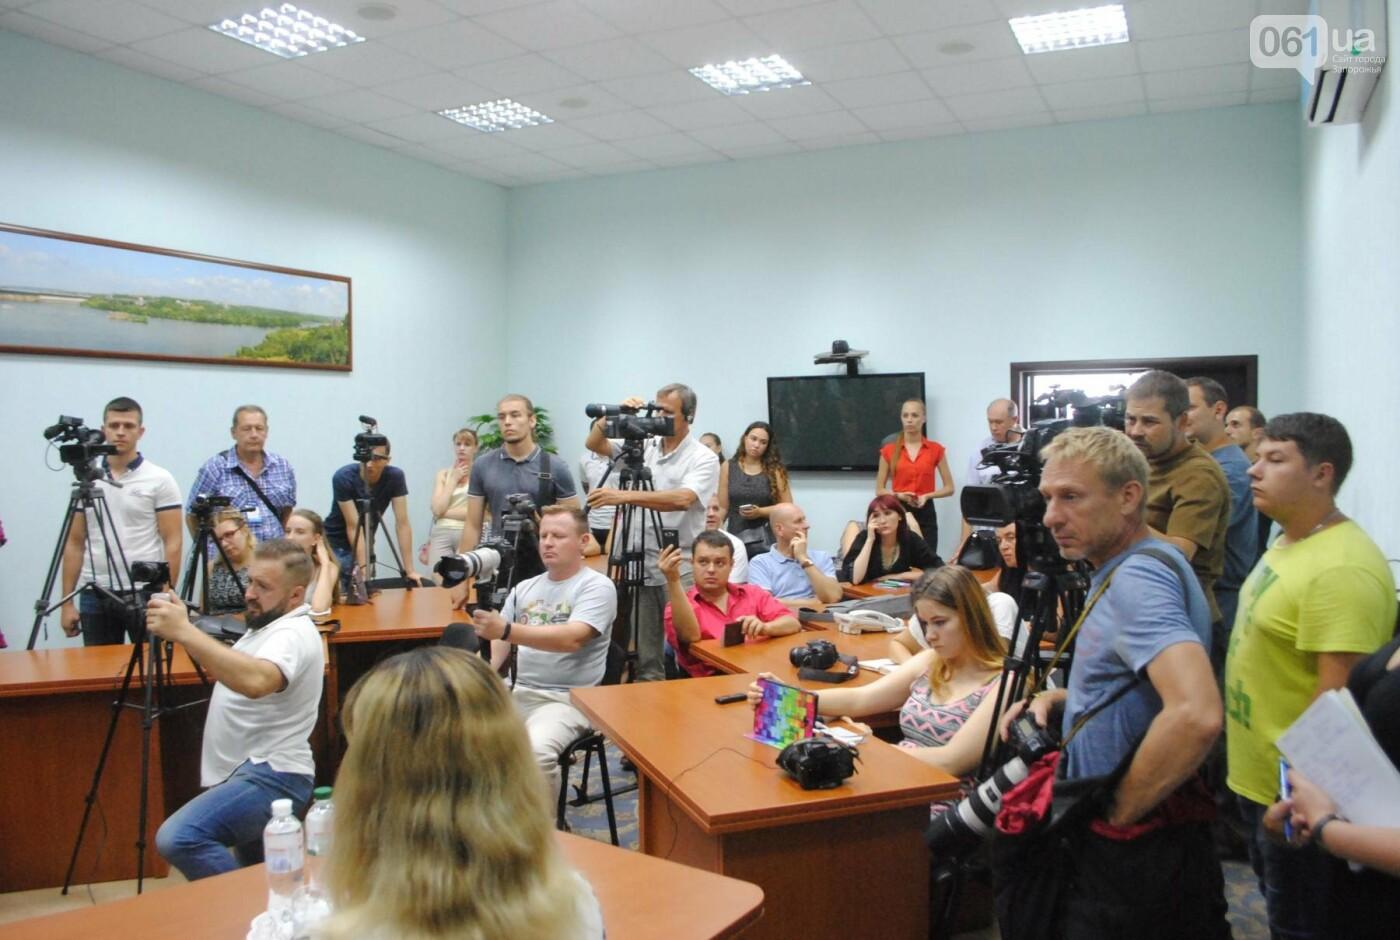 За Олешко следили два дня: в полиции рассказали подробности покушения в Бердянске, - ФОТО, фото-6